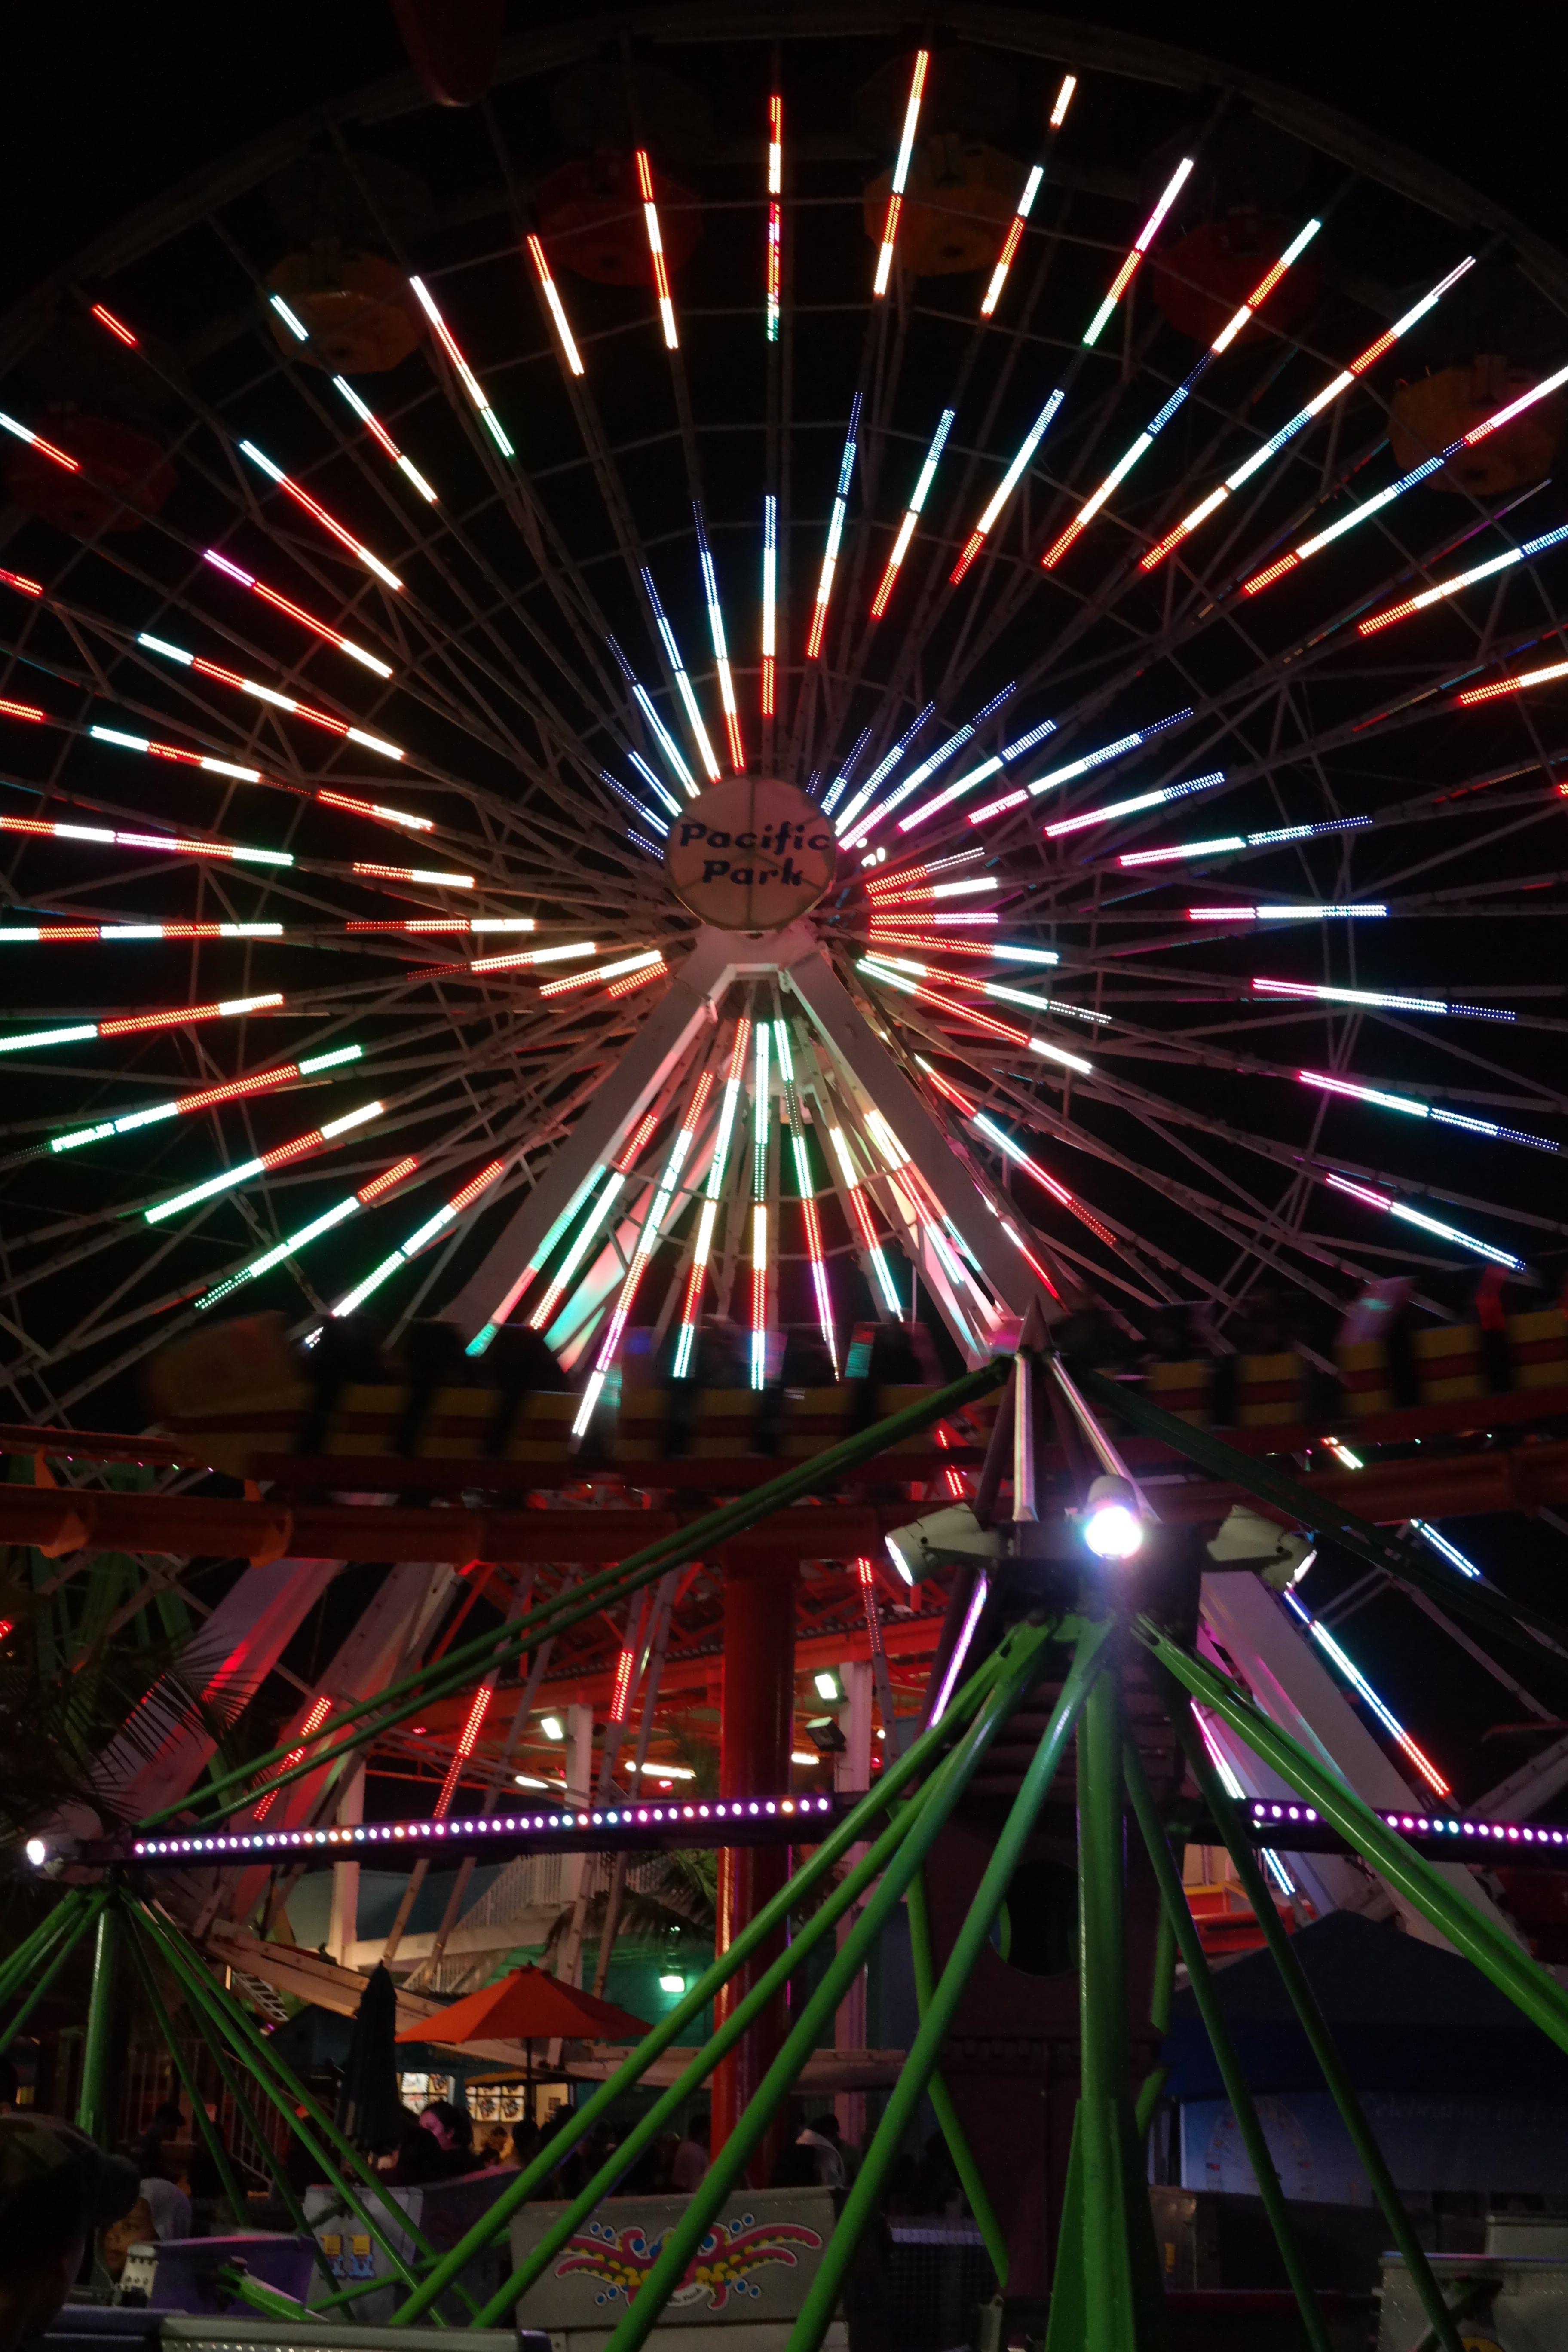 Santa Monica Pier ferris wheel lit up at night